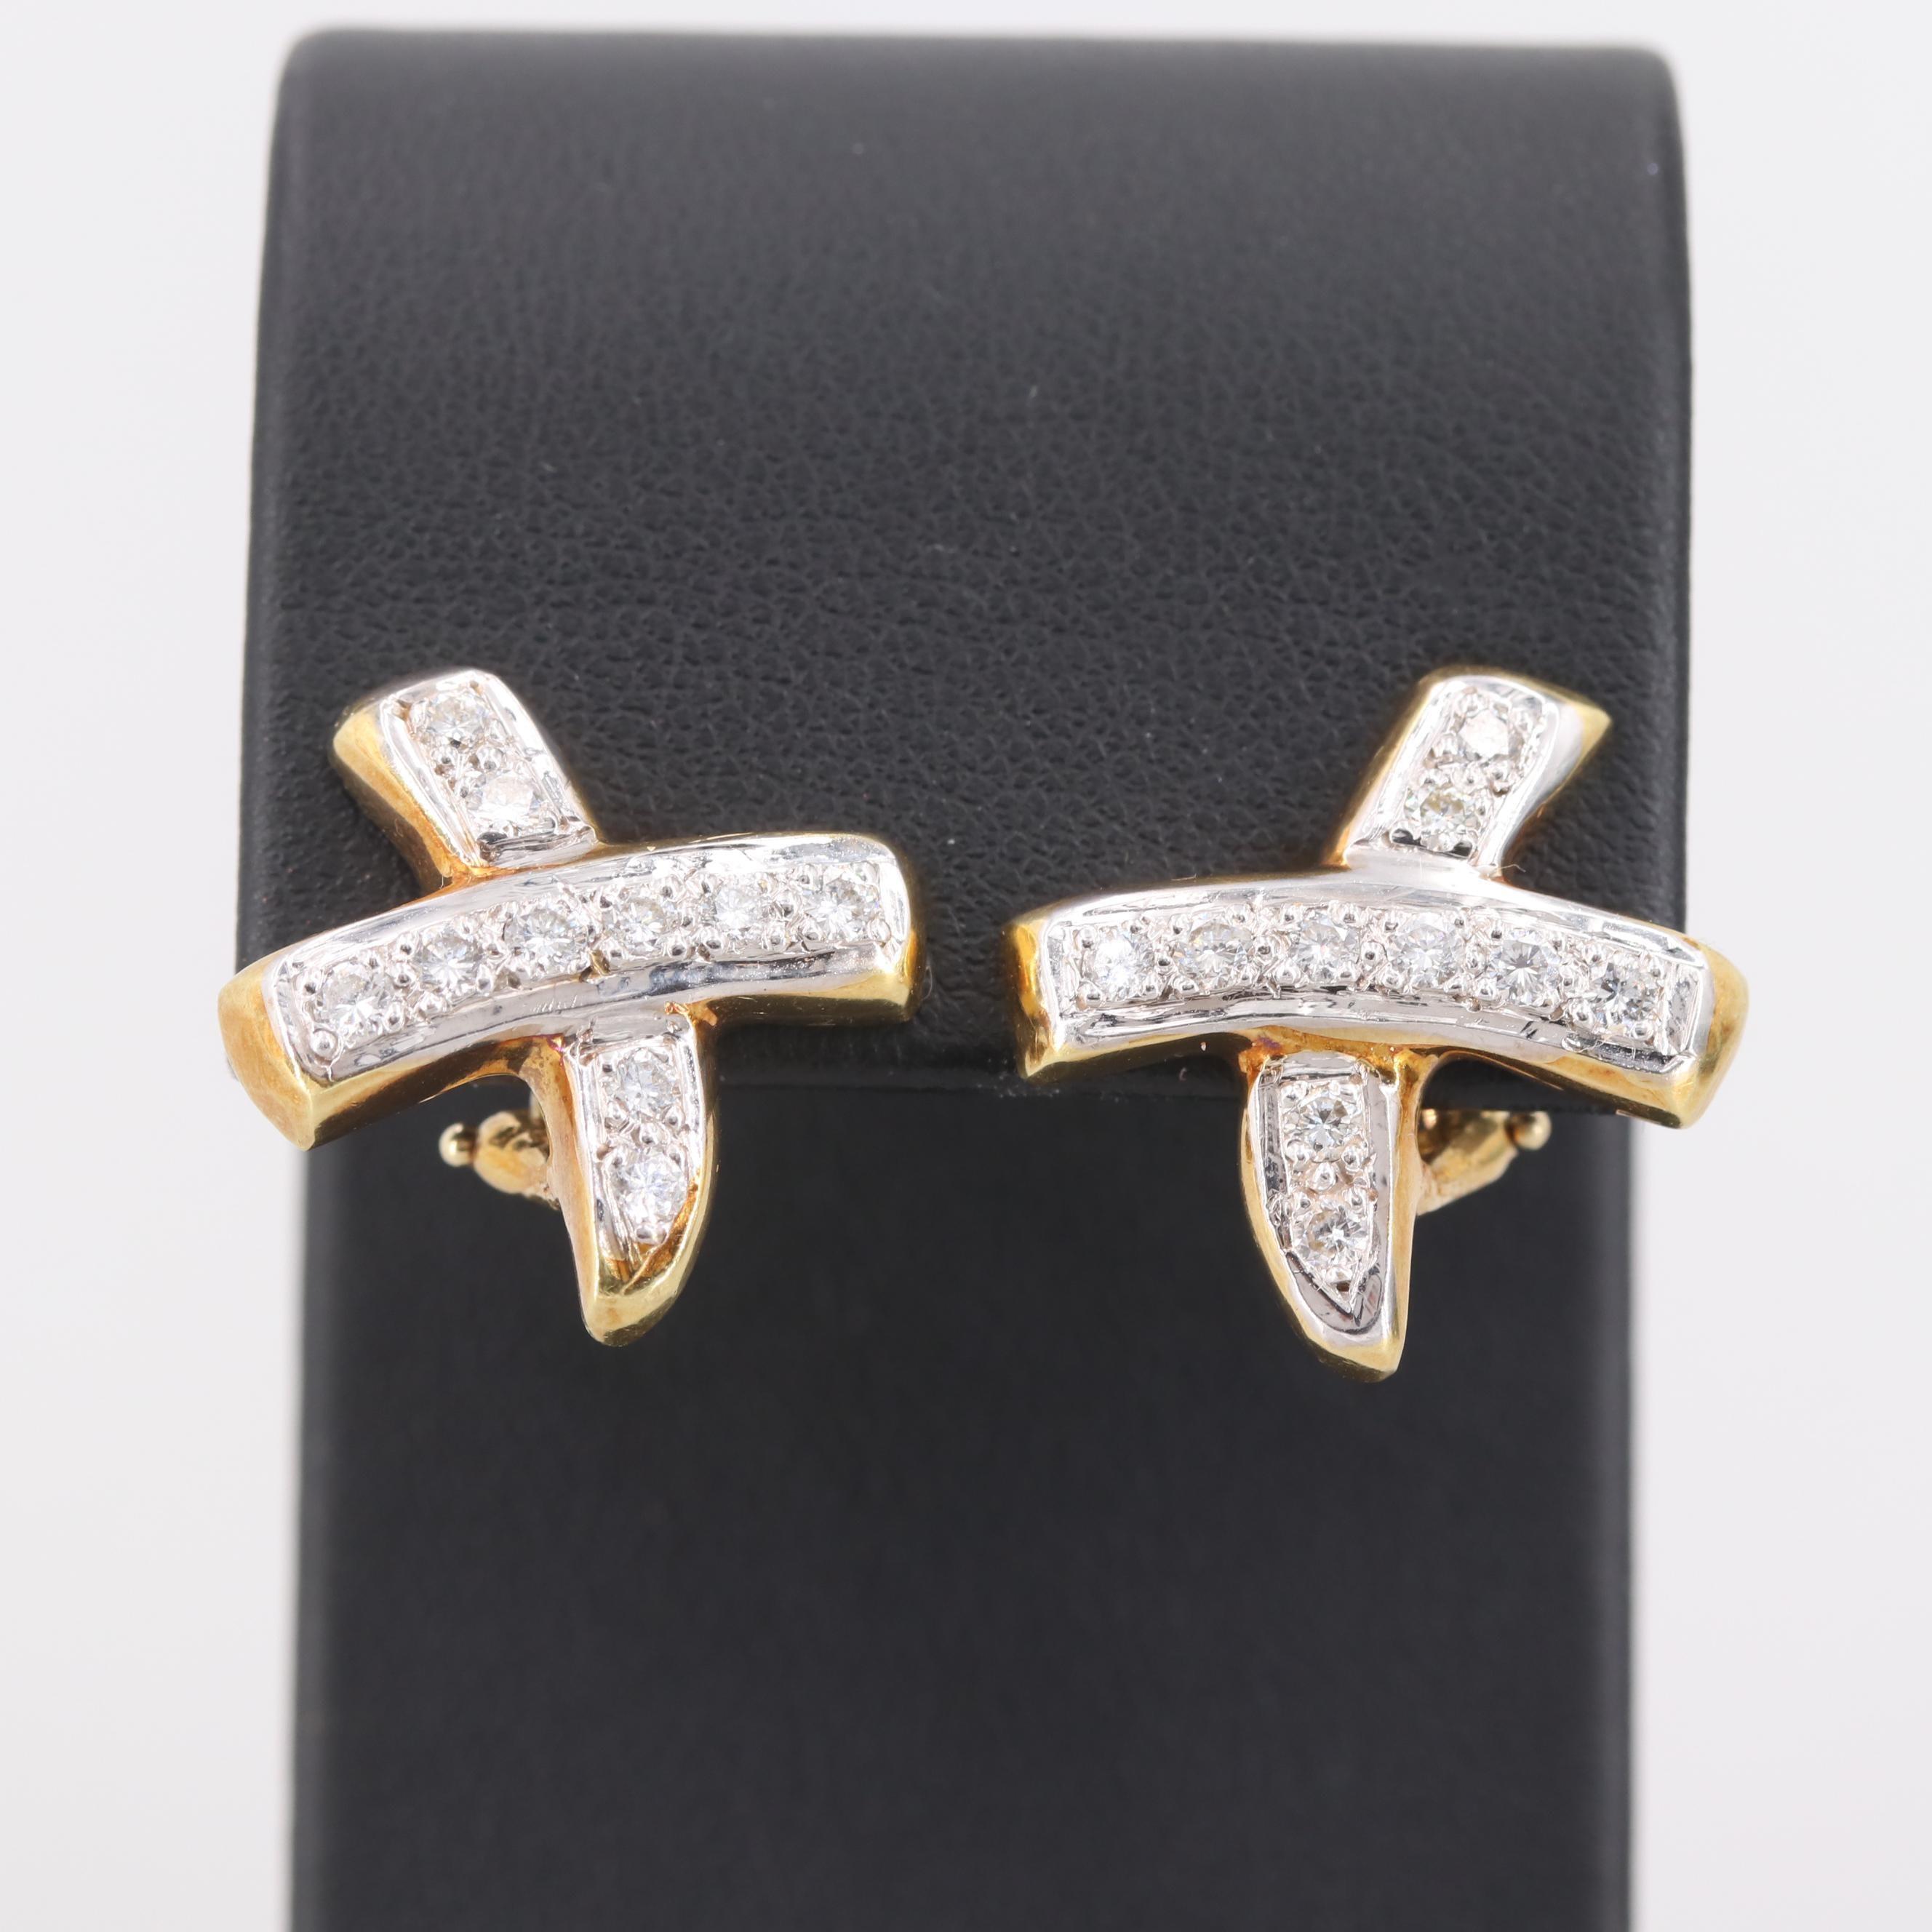 18K and 14K Yellow Gold Diamond Earrings